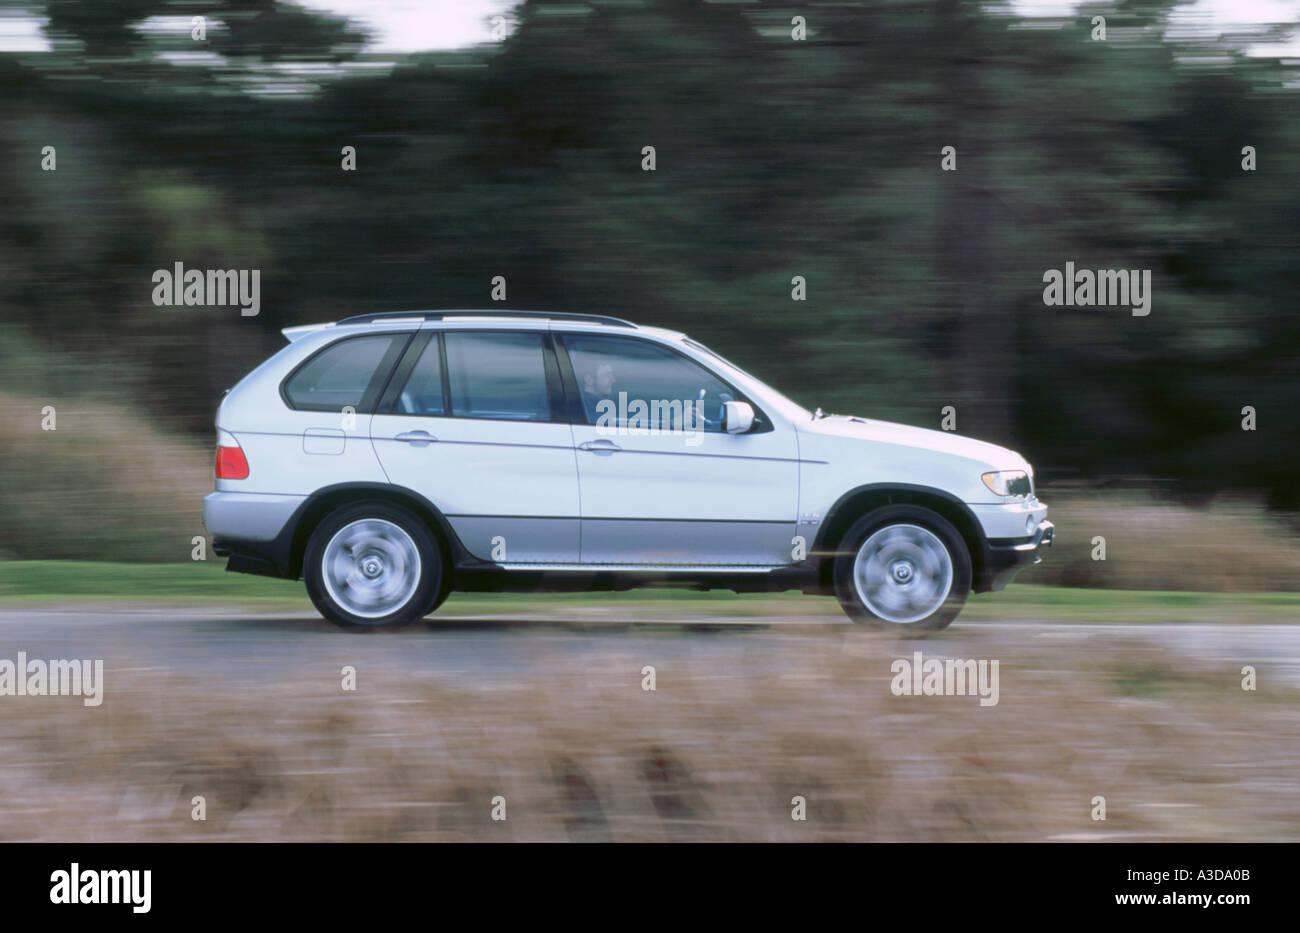 2001 BMW X5 4.4i - Stock Image